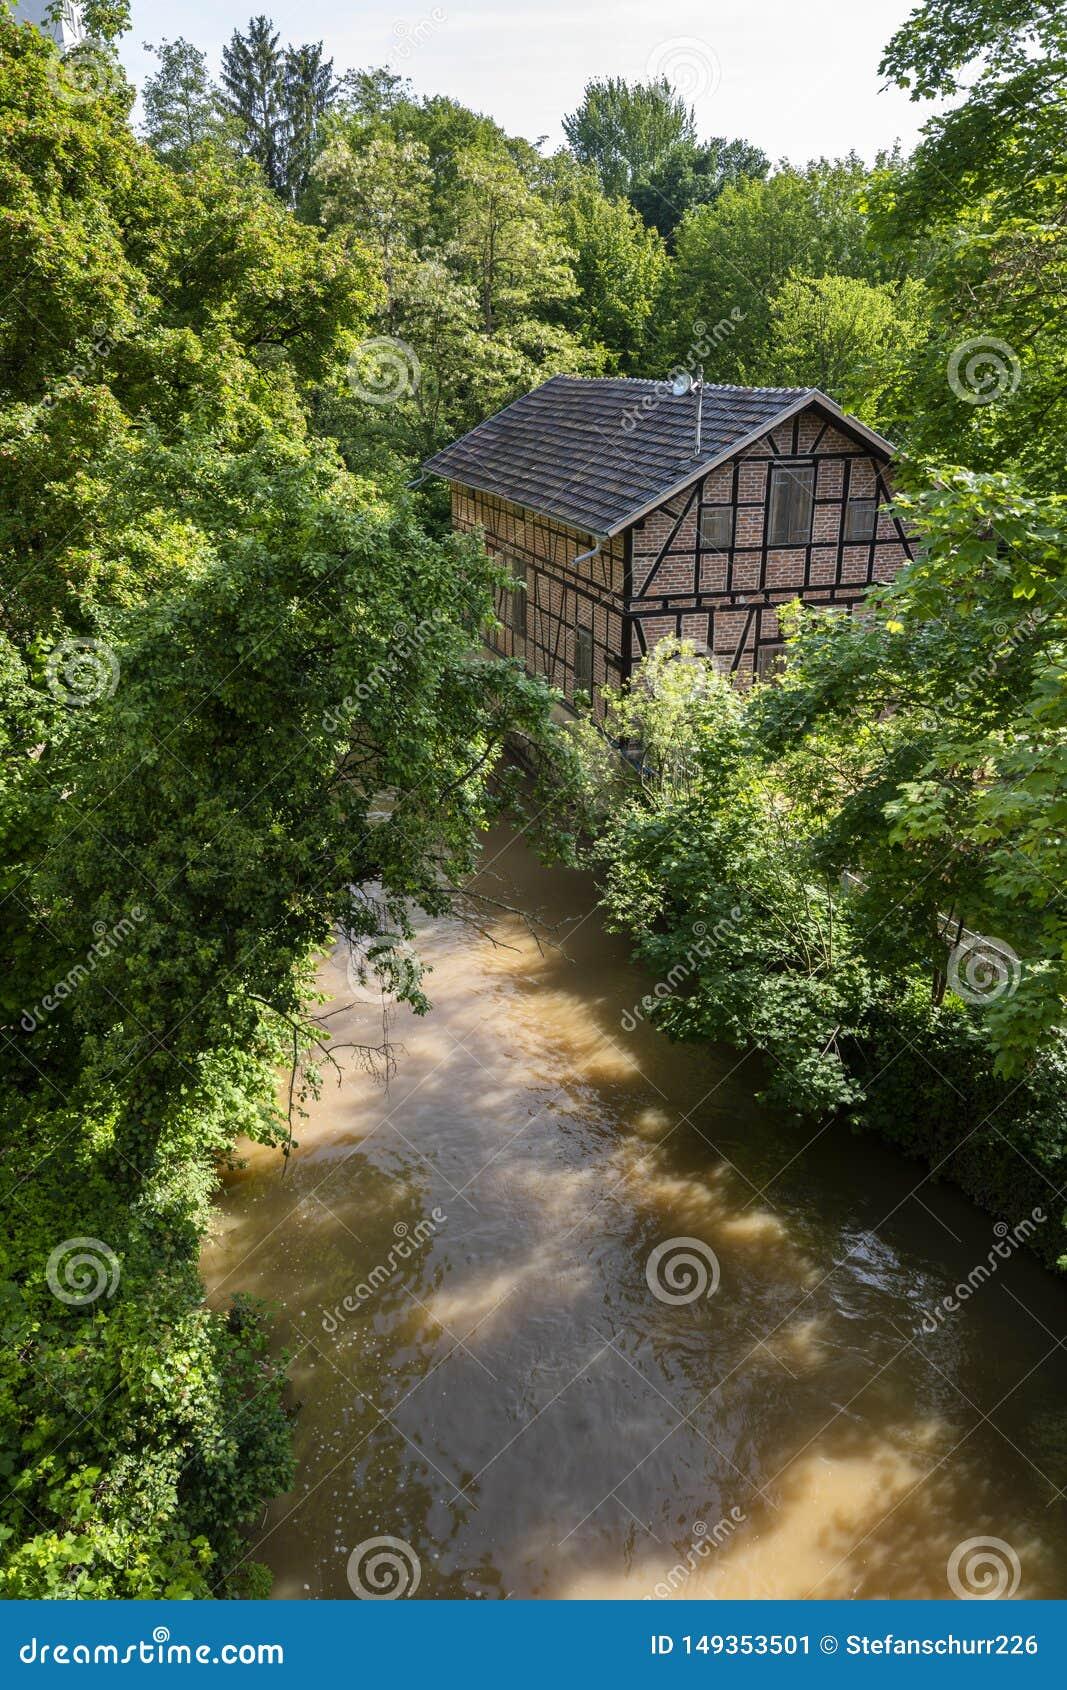 Maison bois?e dans Waiblingen, rems Murr Kreis, Allemagne